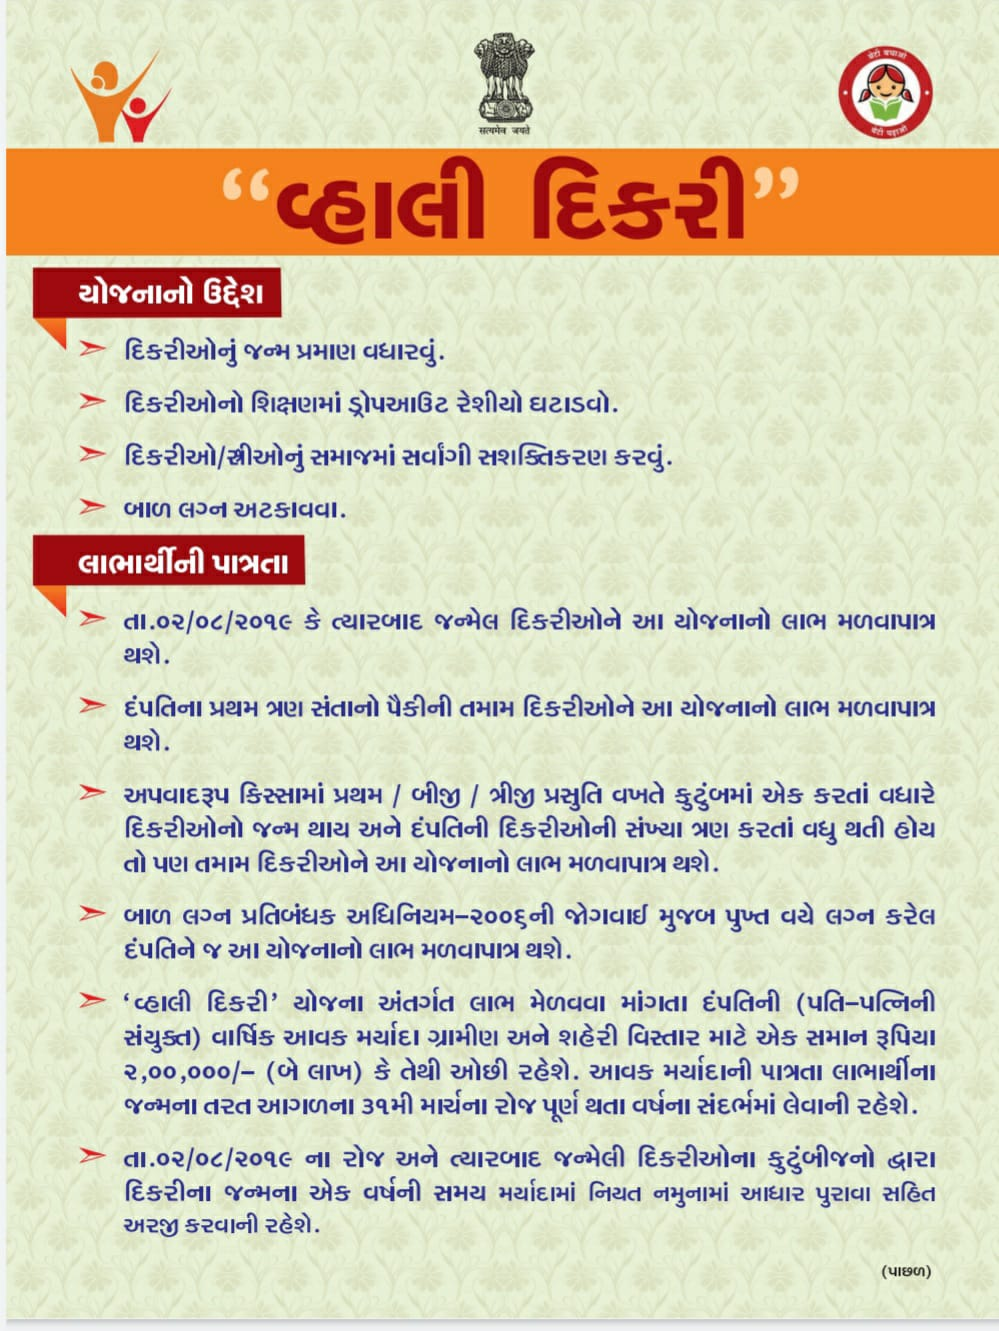 https://project303.blogspot.com/2021/02/vahali-dikari-yojana.html